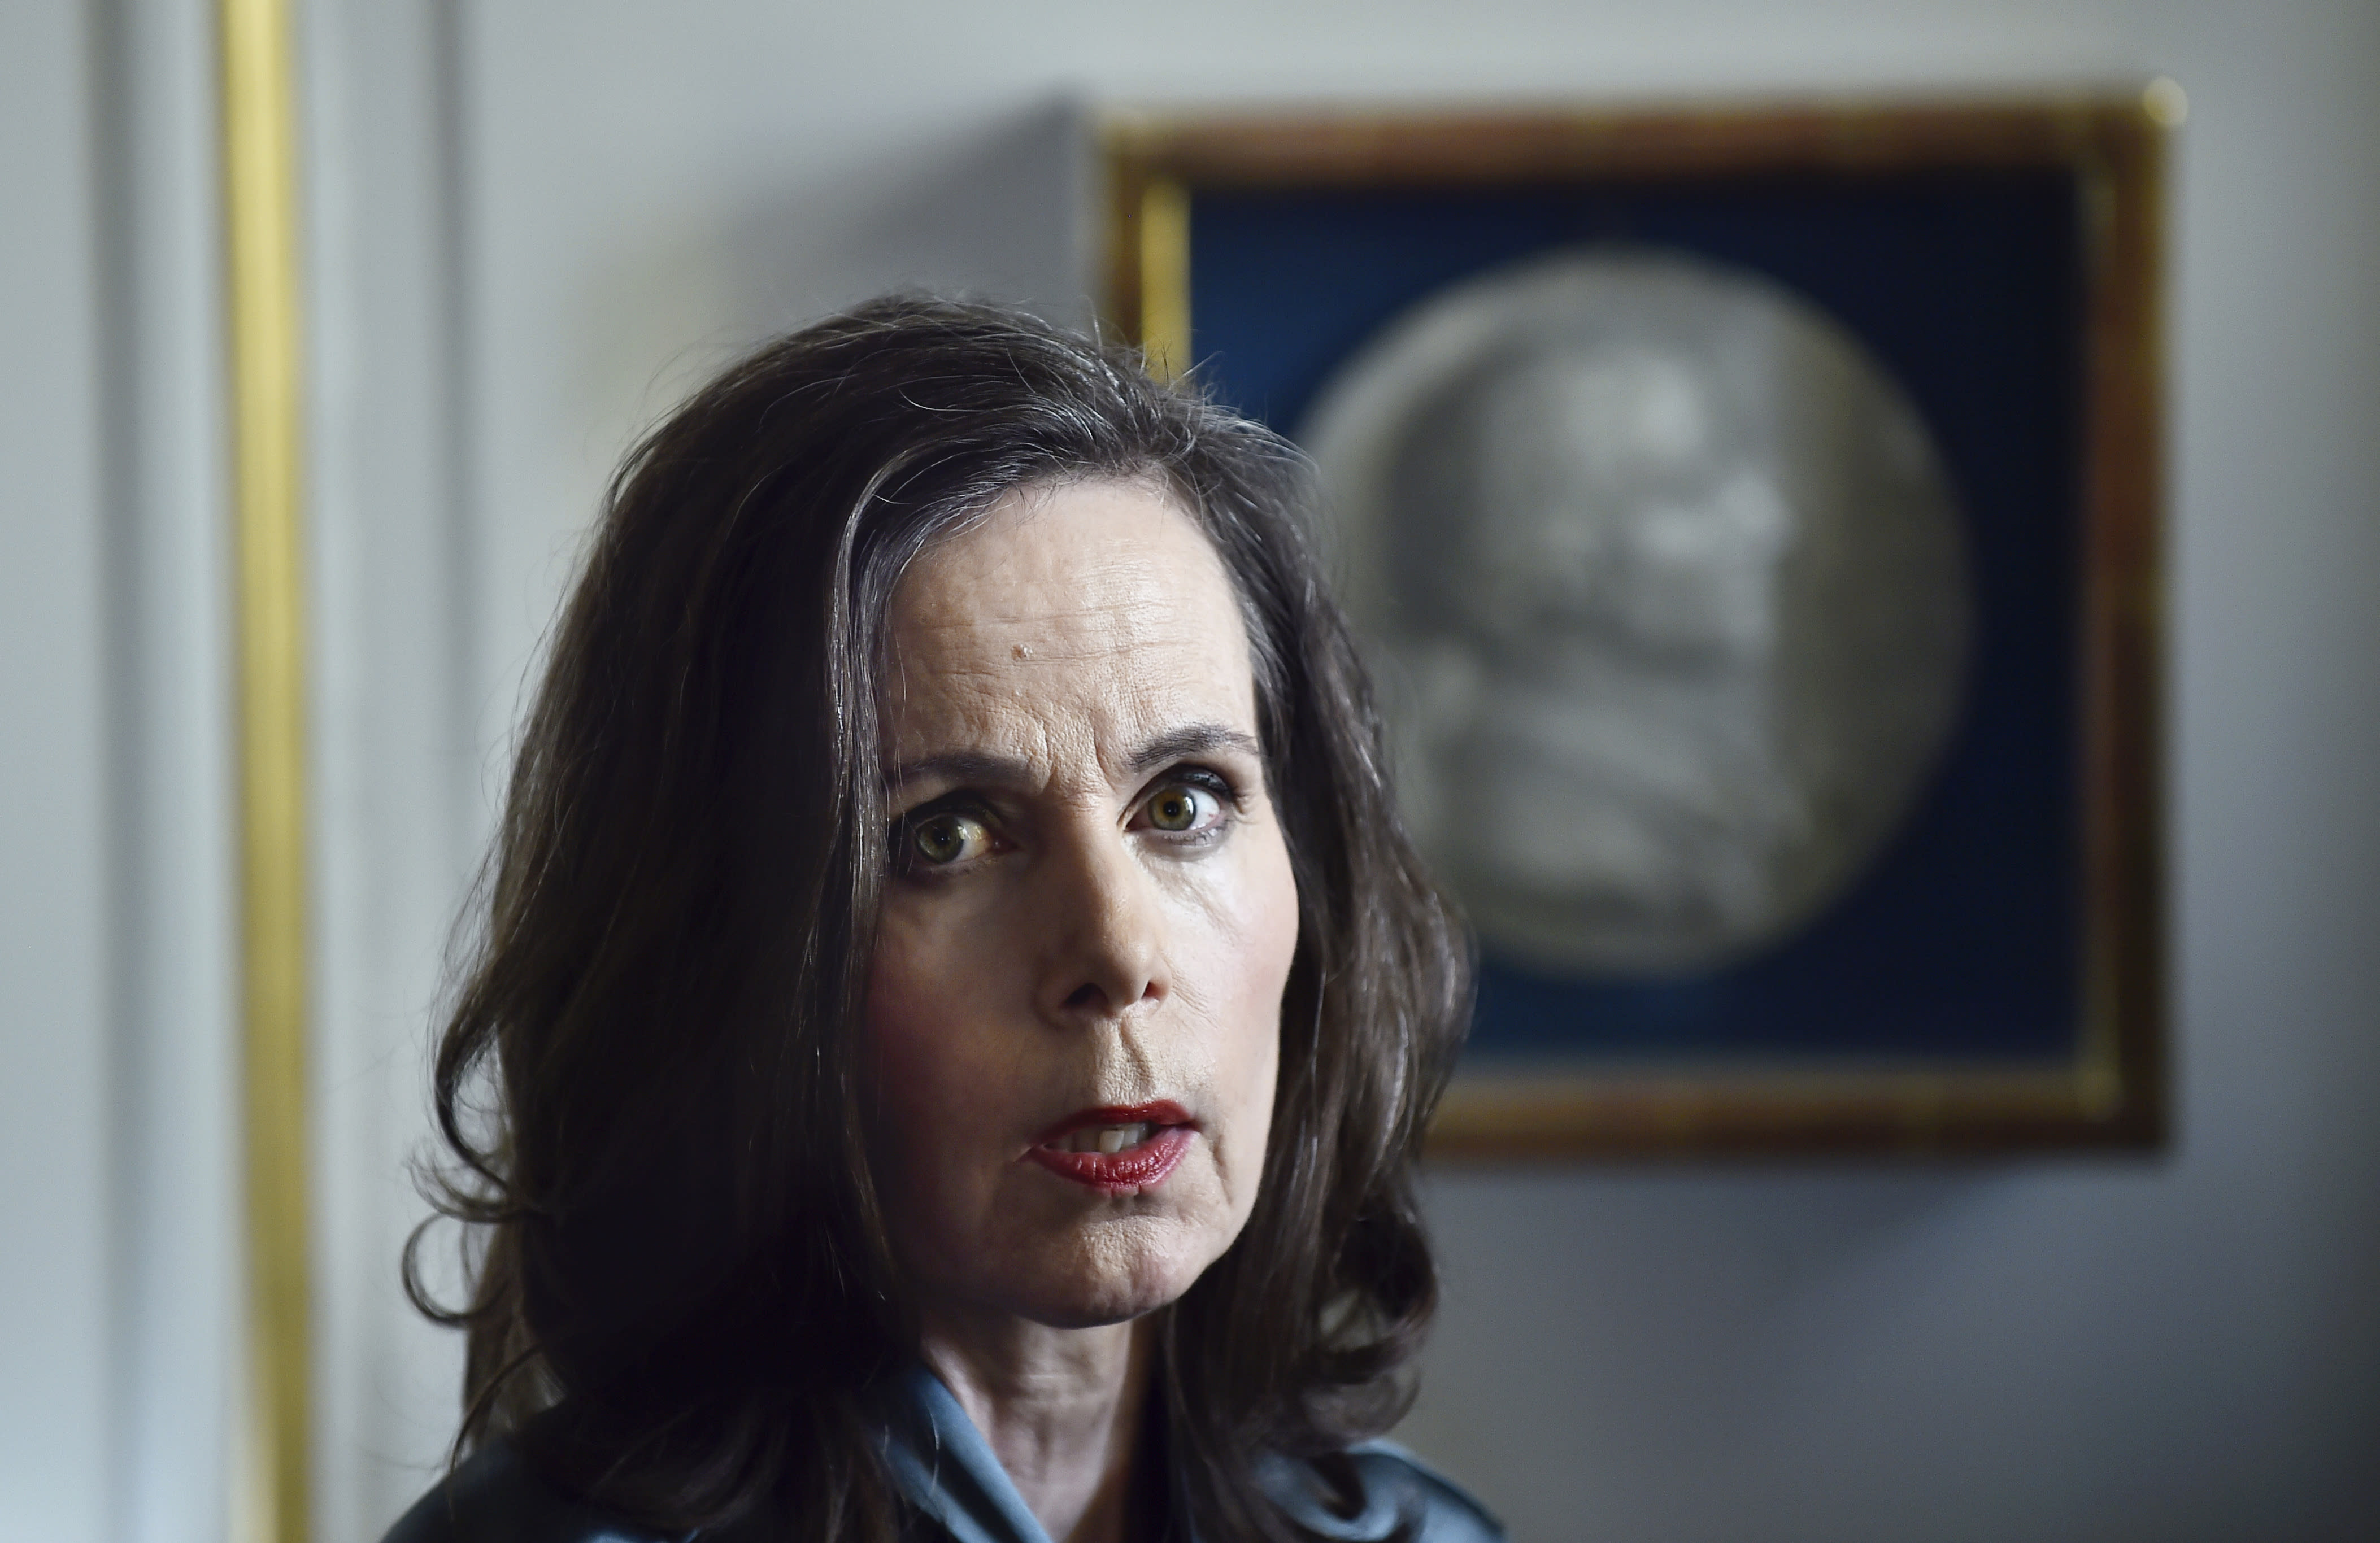 Sara Danius, 57, first female head of Nobel's literature award body